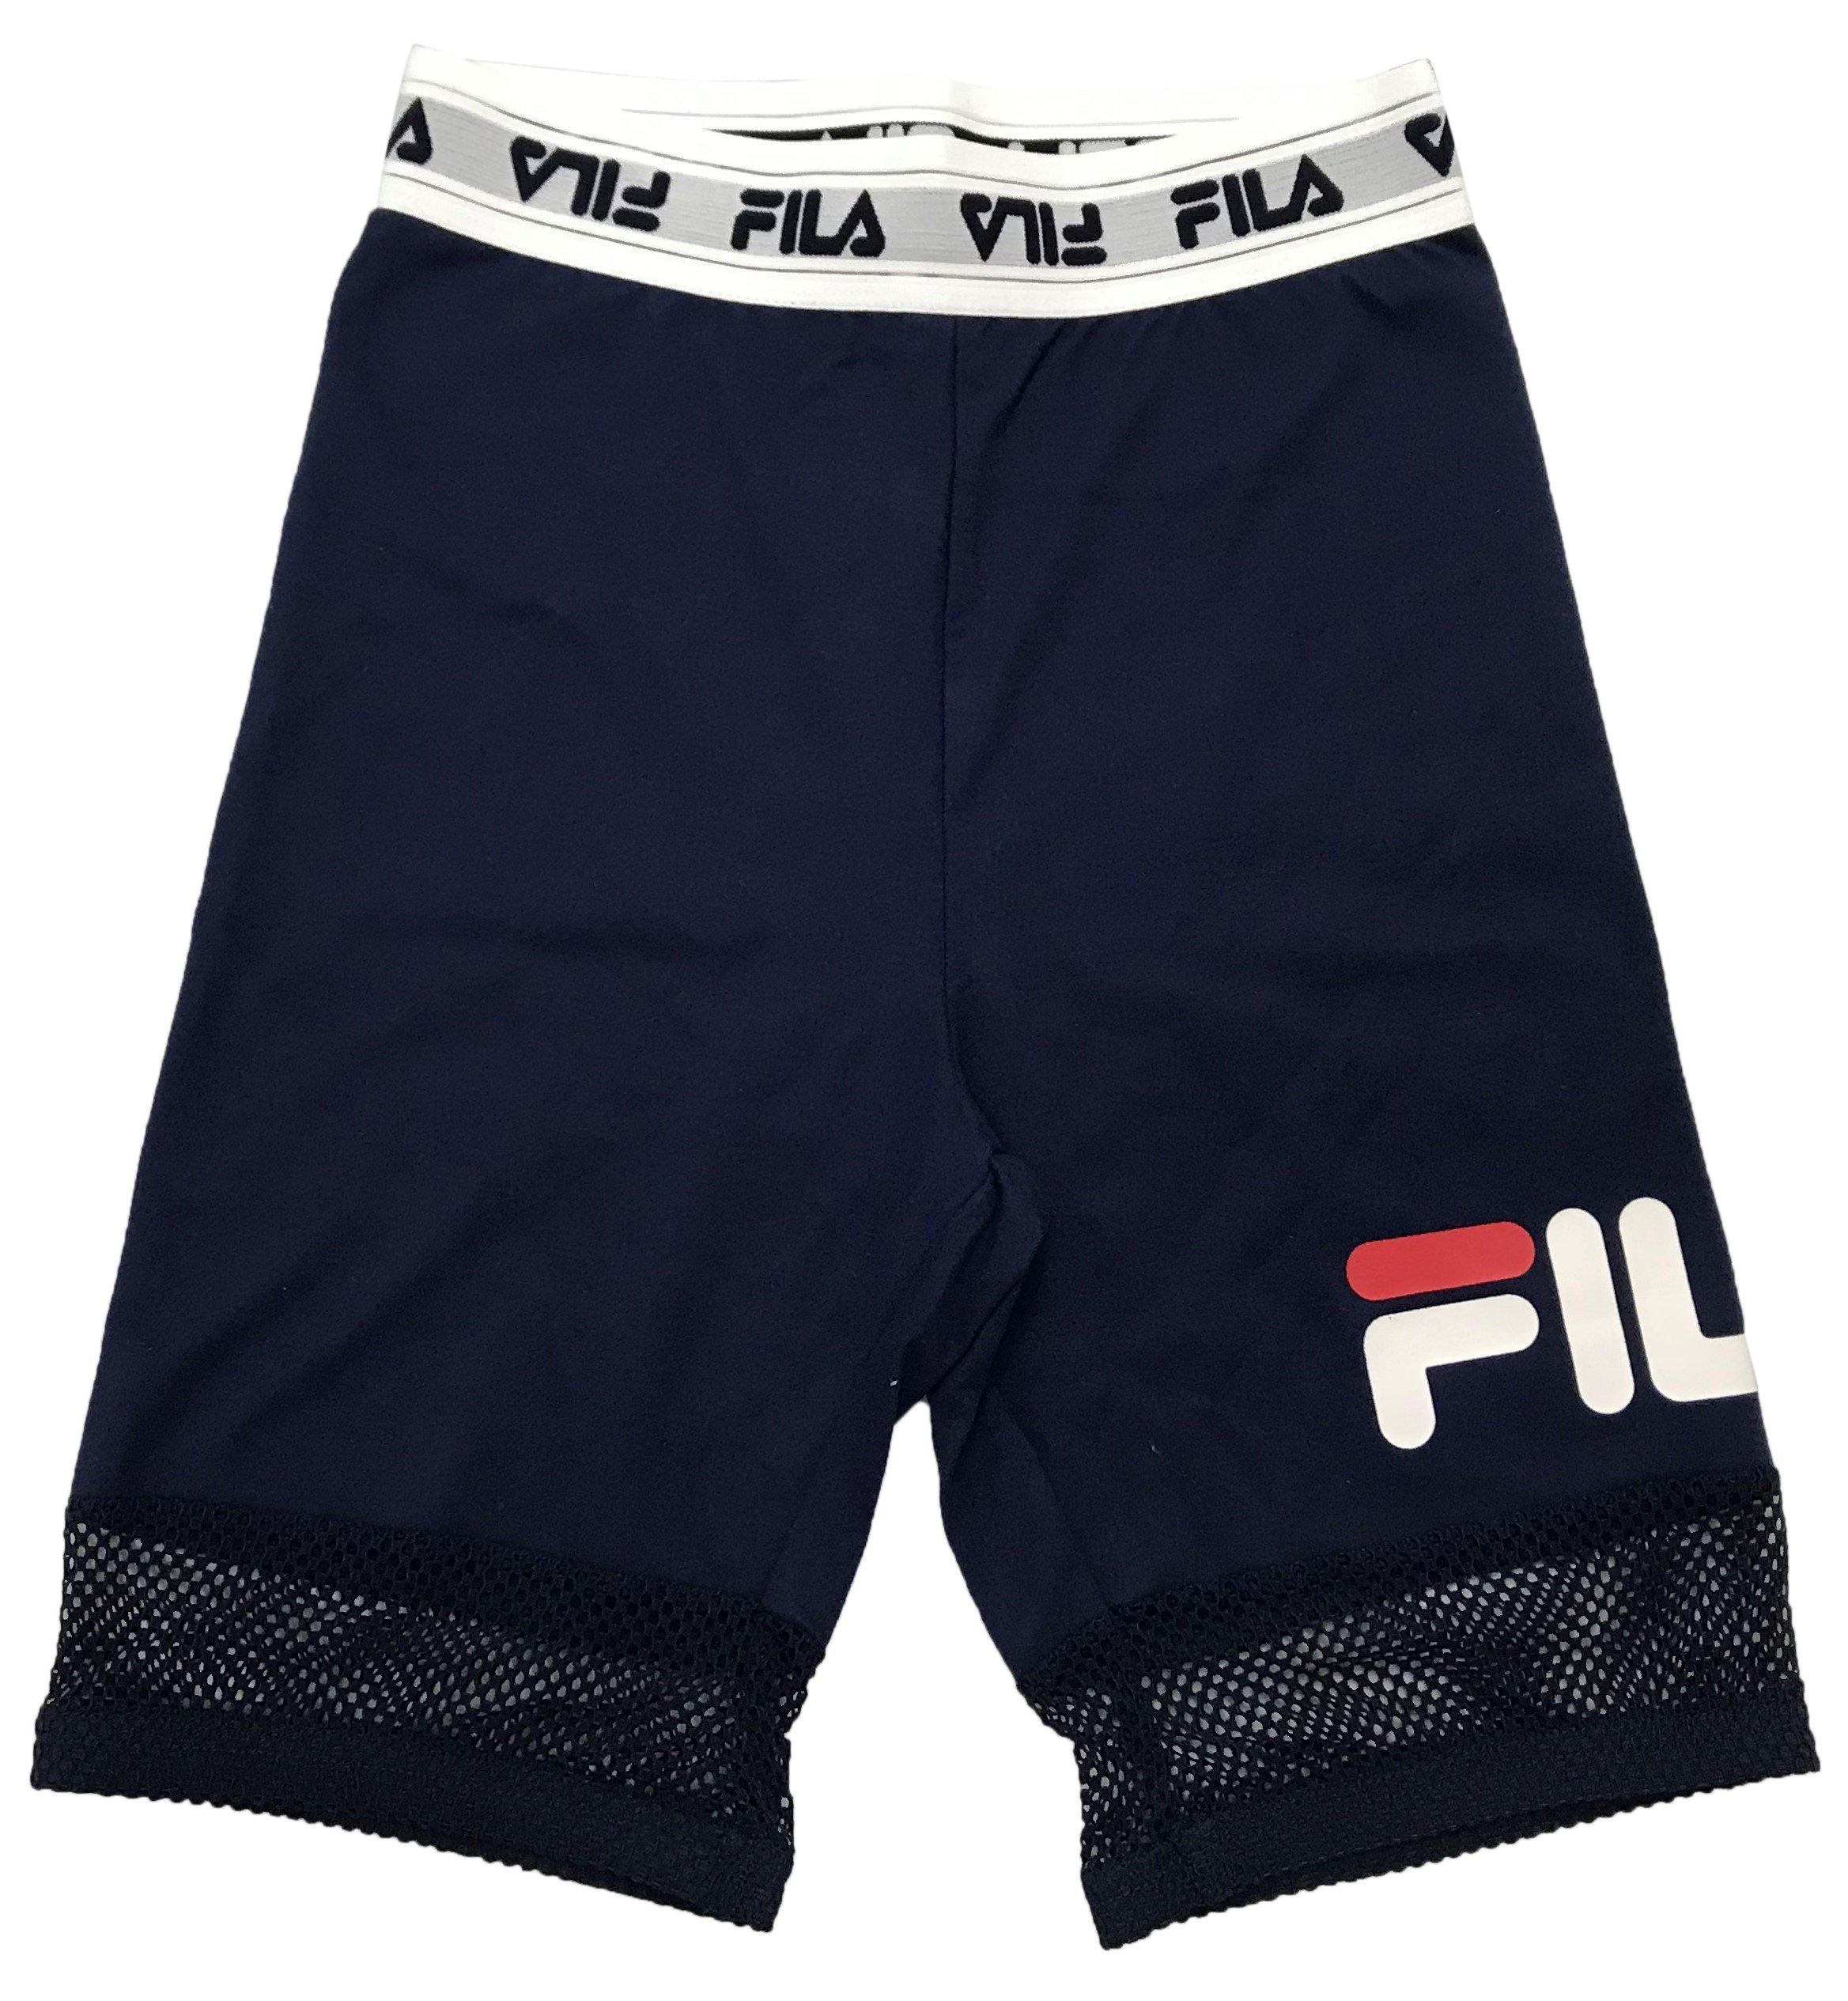 Fila Donatella Tight Shorts (Peacoat, L)